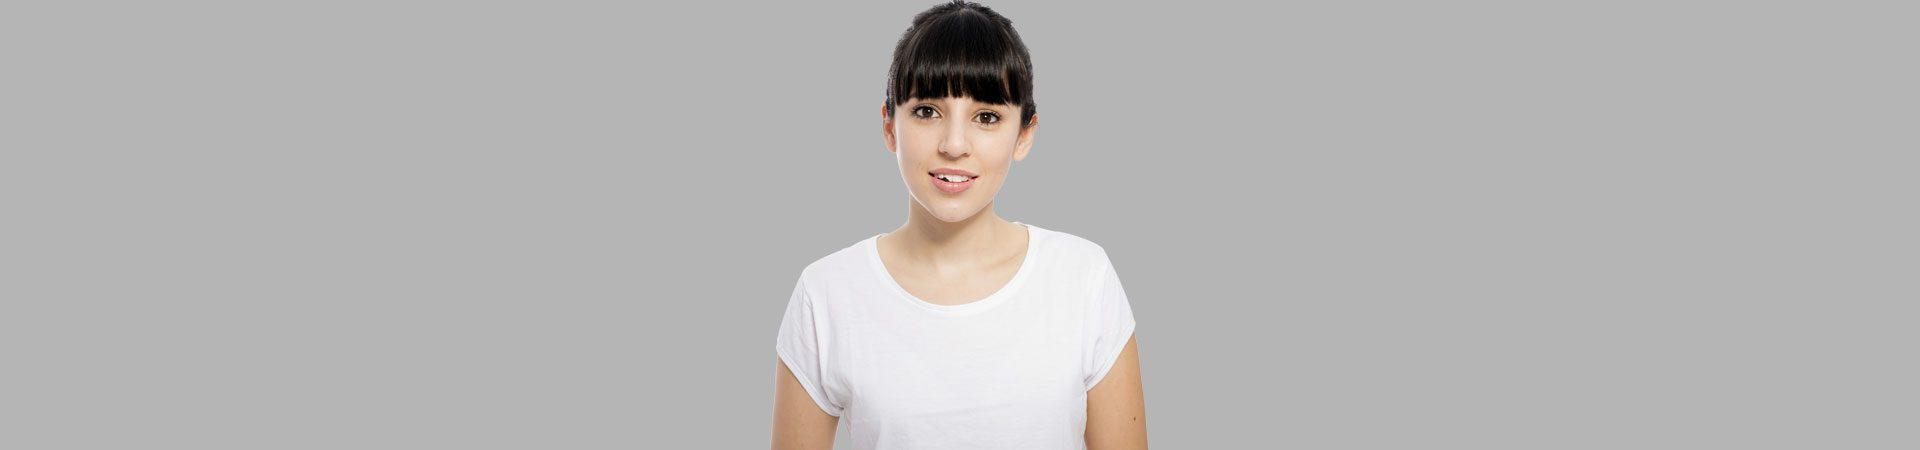 Broken Tooth? 5 Tips on Handling Damaged Teeth